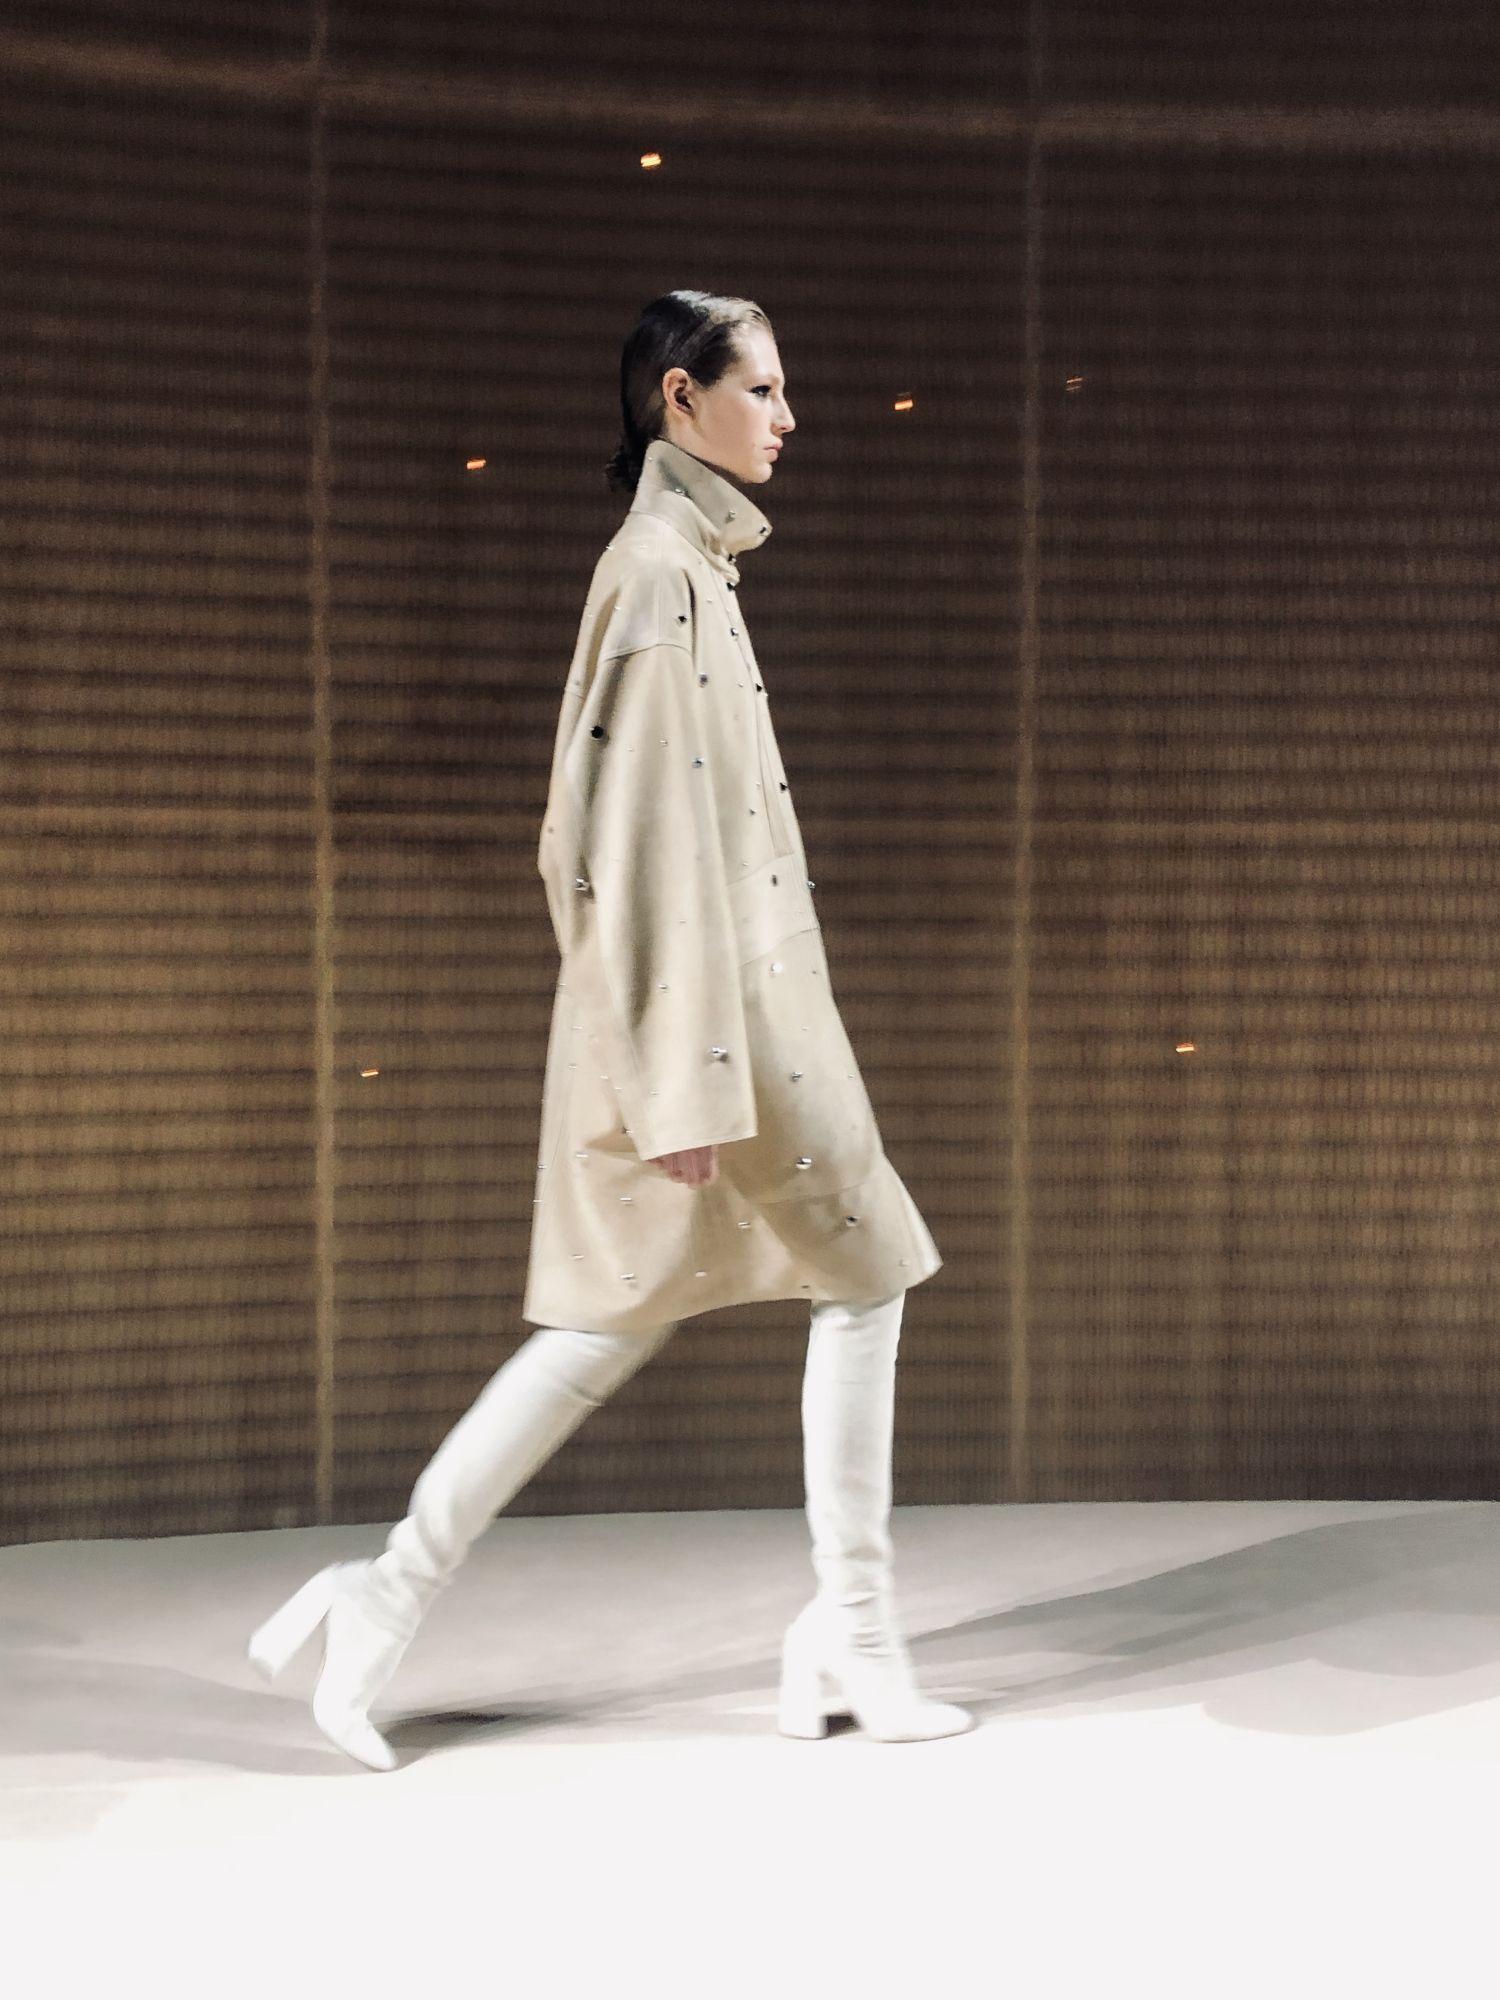 Paris Fashion Week Autumn/Winter 2019: Day 5 Highlights